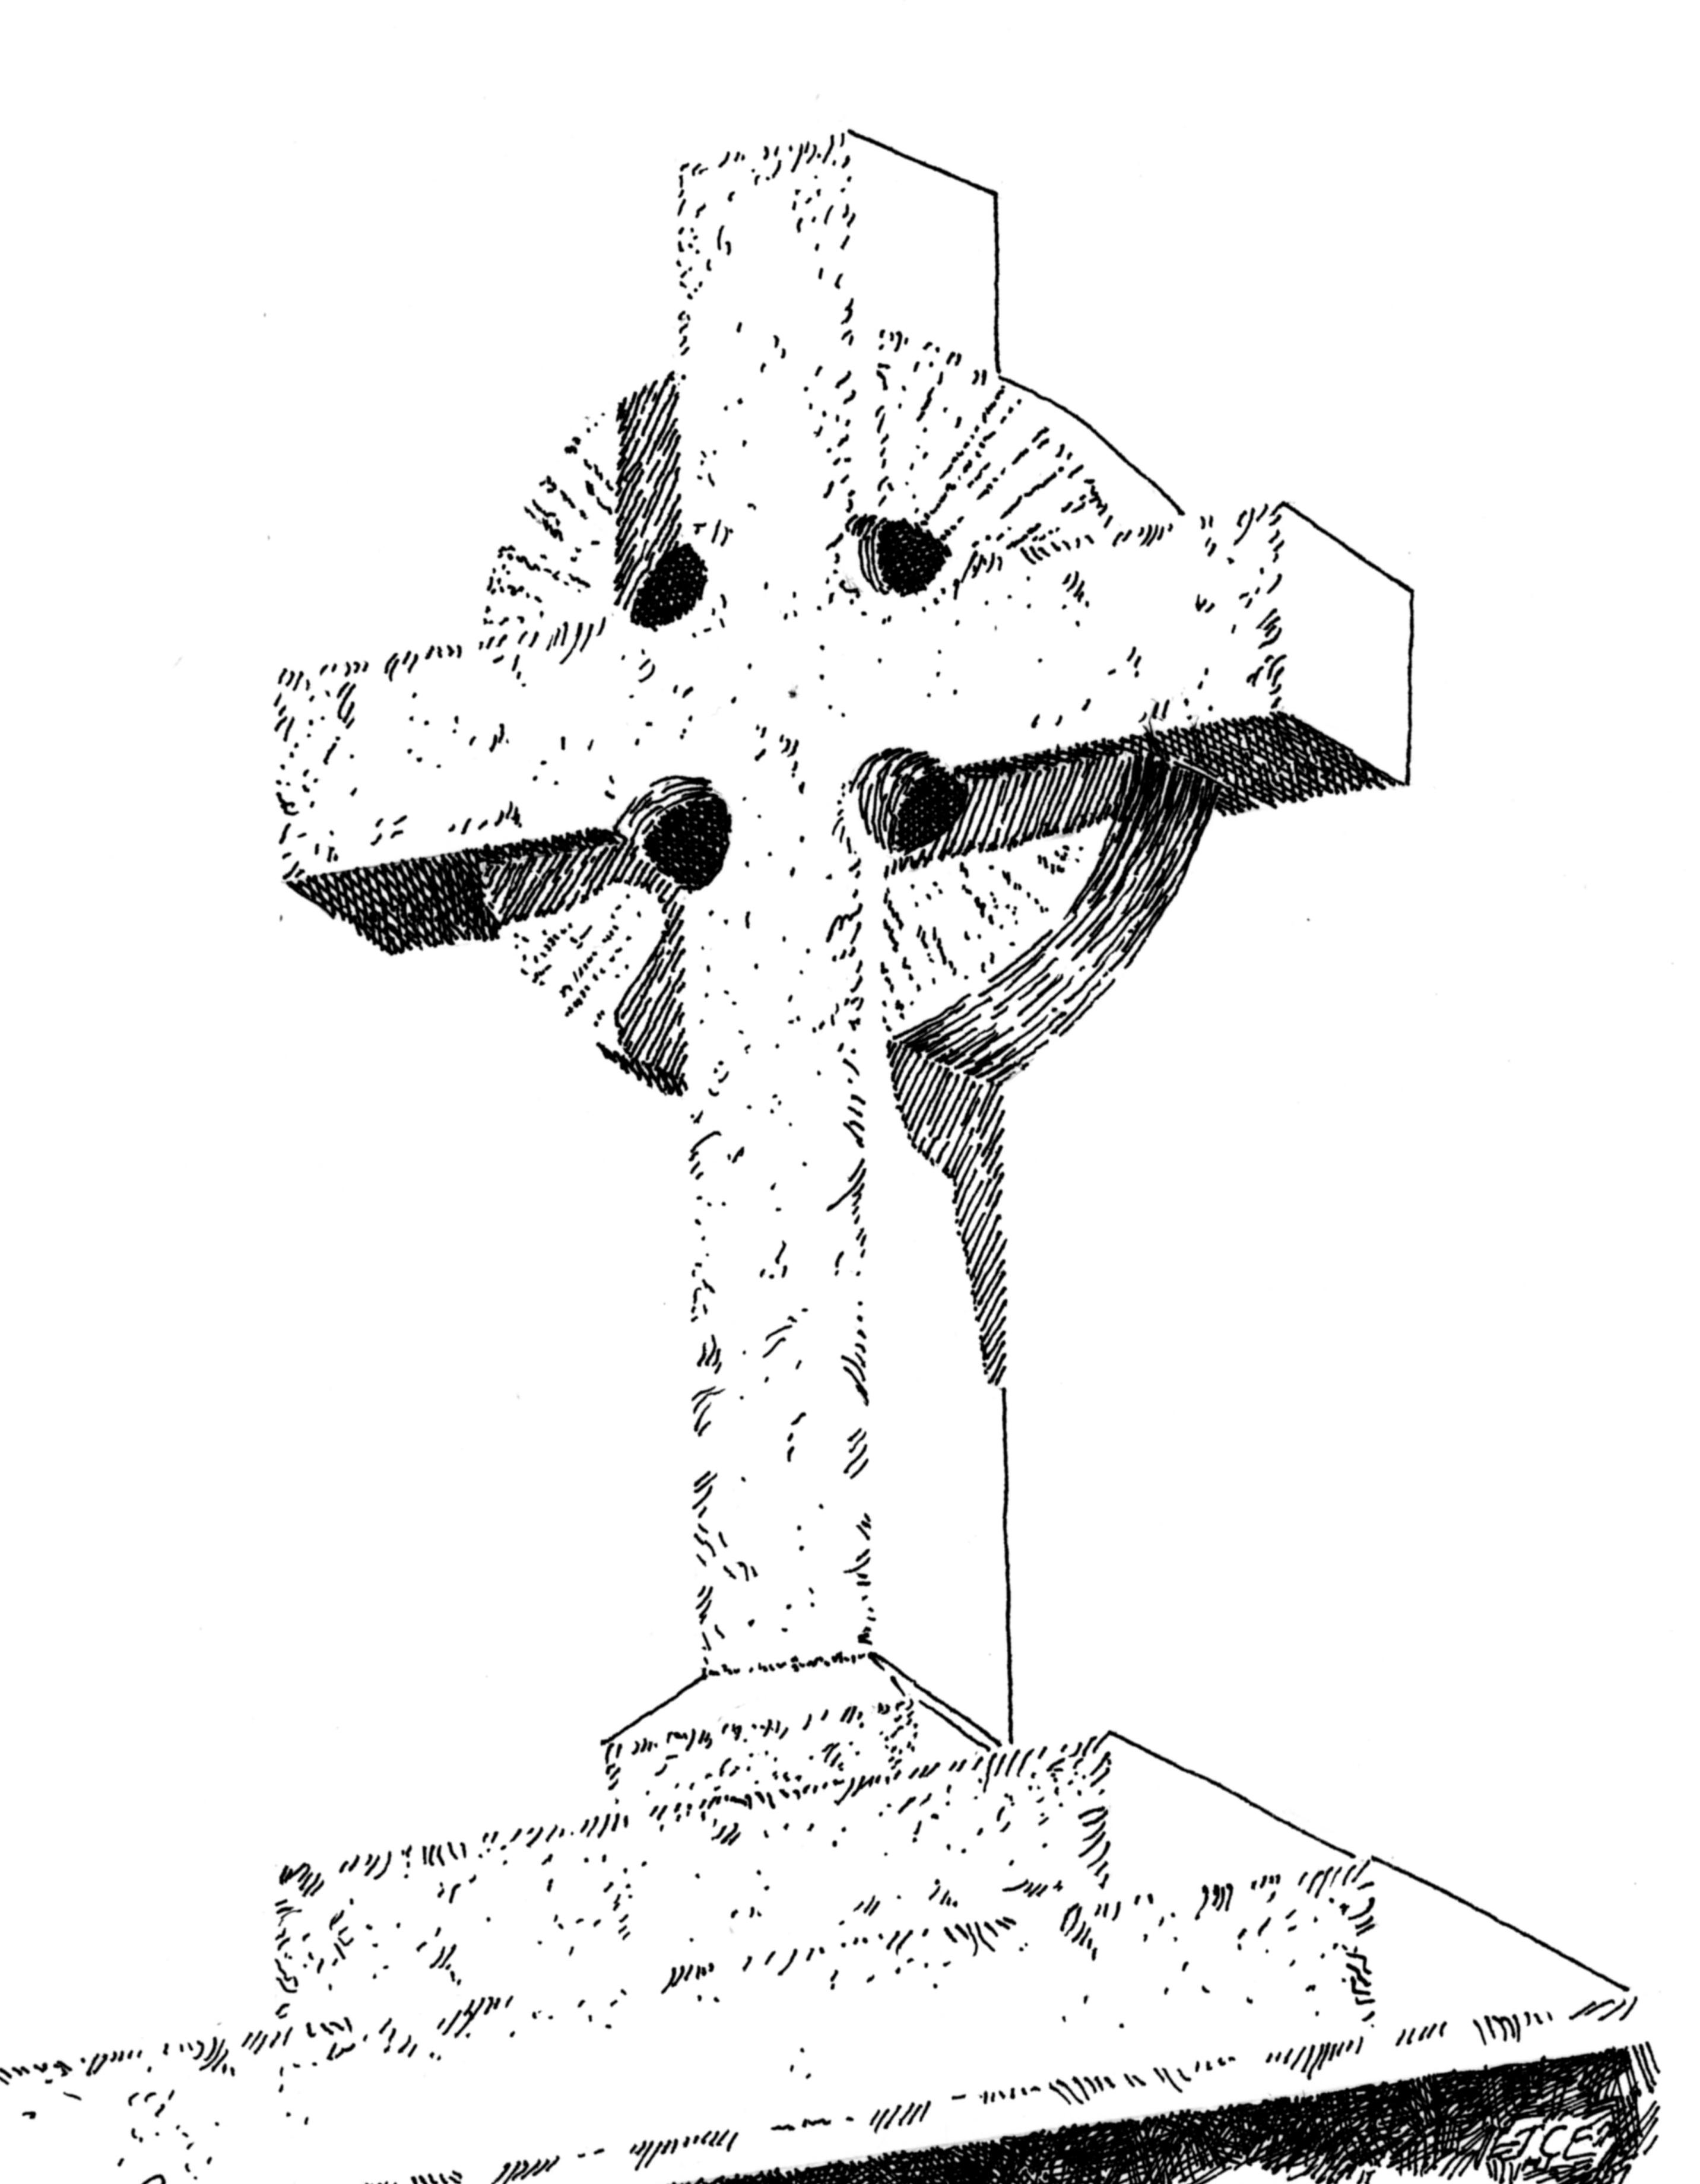 personal statement of faith presbyterian